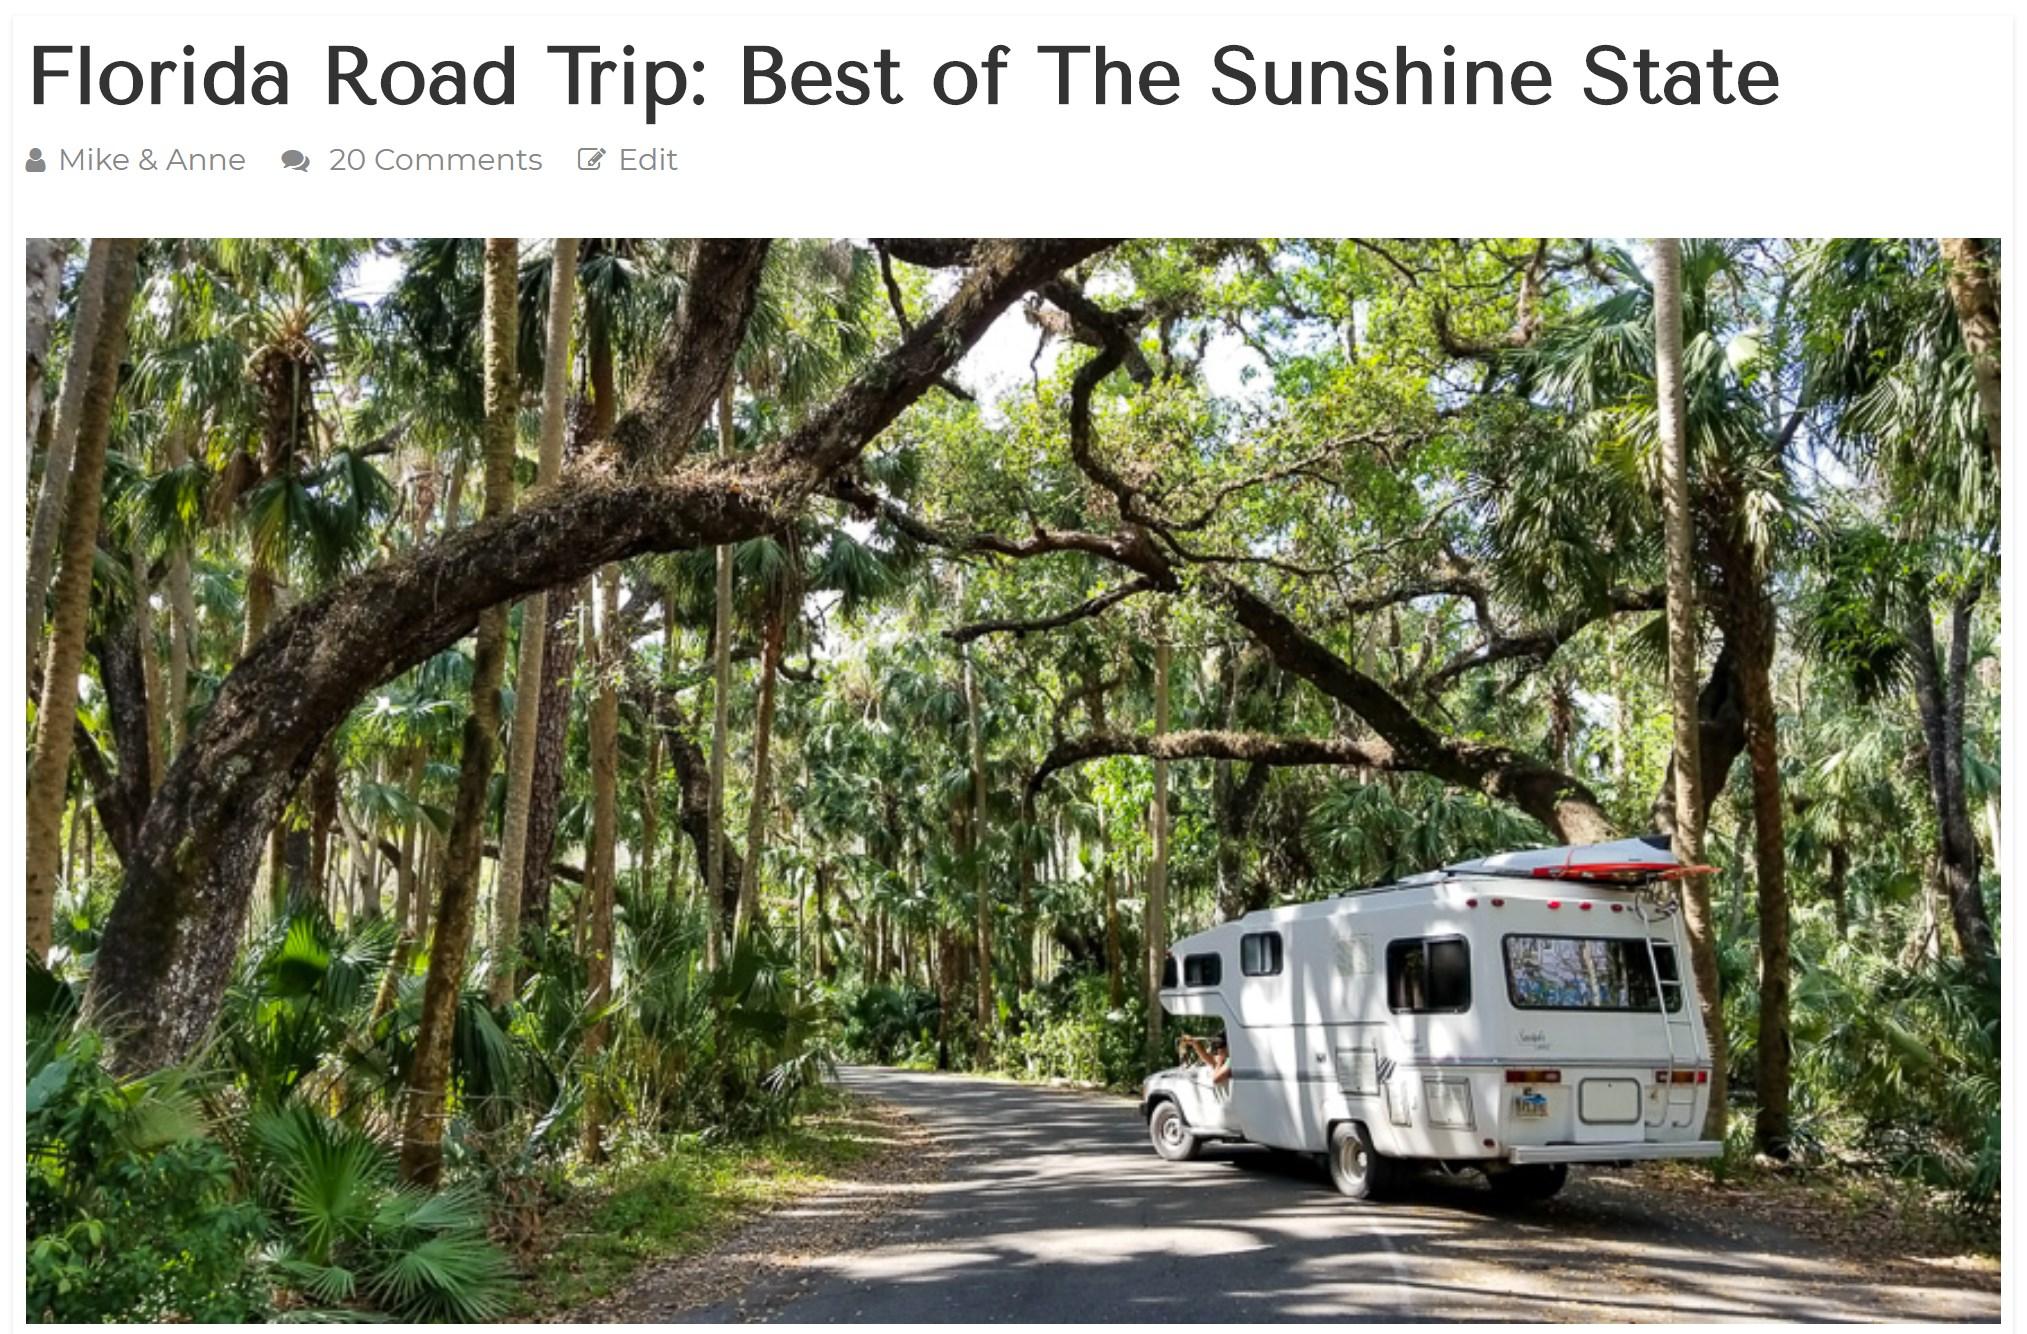 Floriday Road Trip